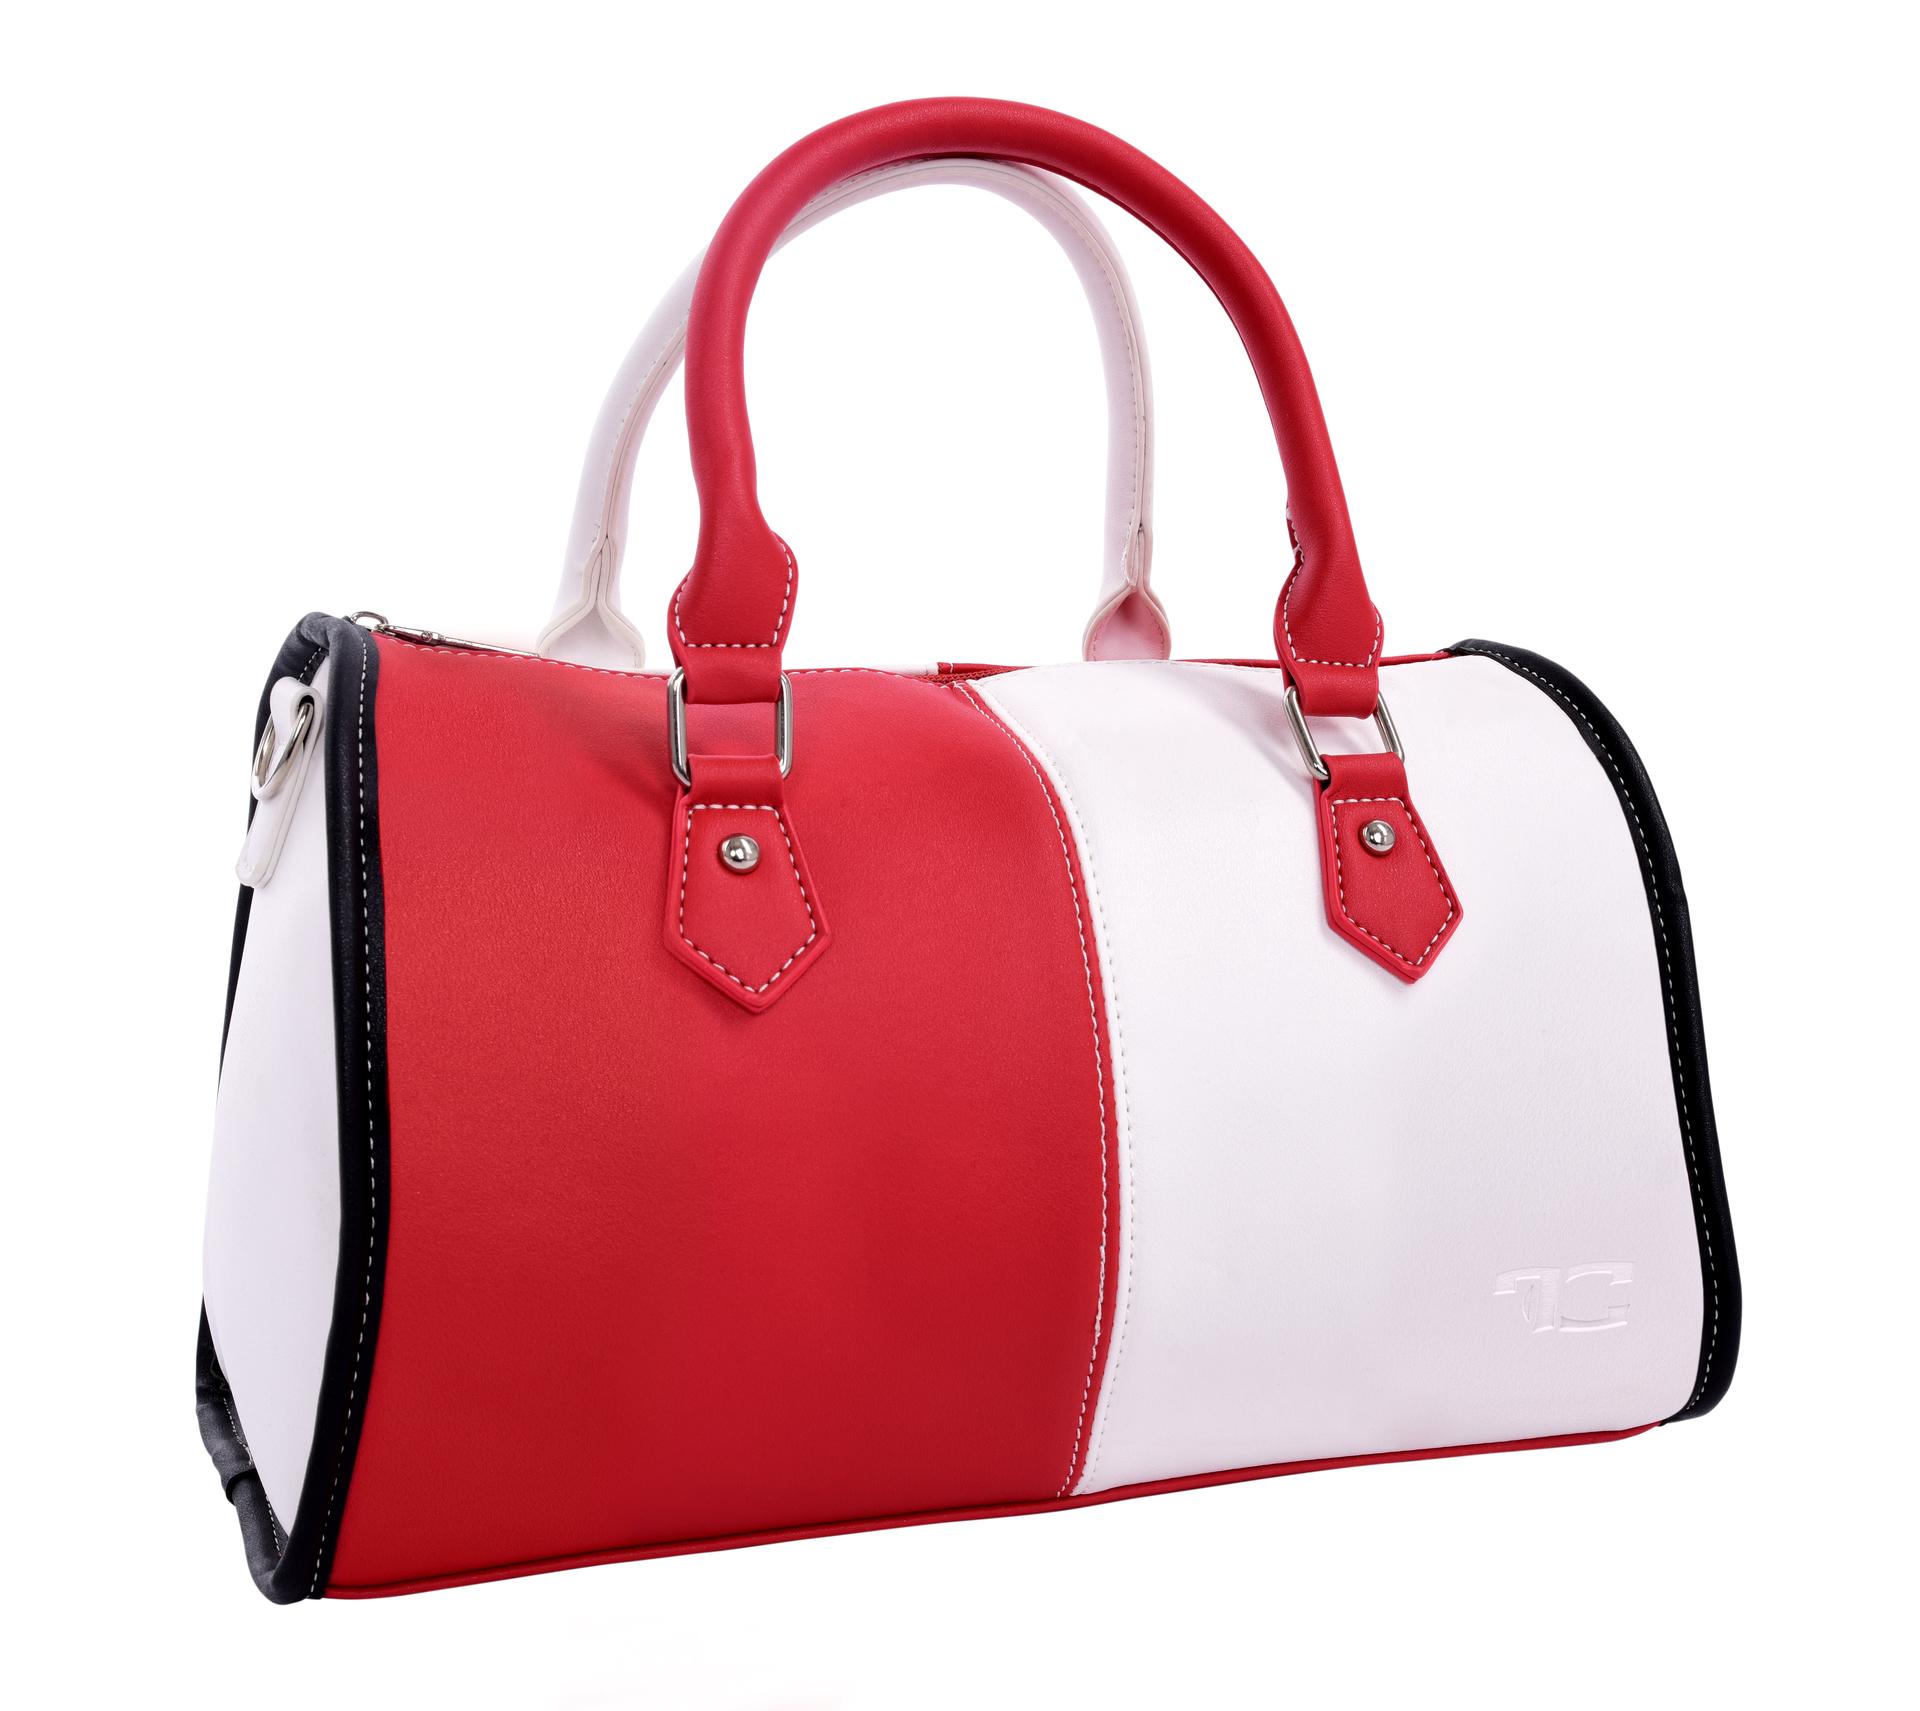 MYSTIQUE kabelka z ekokože červeno-biela